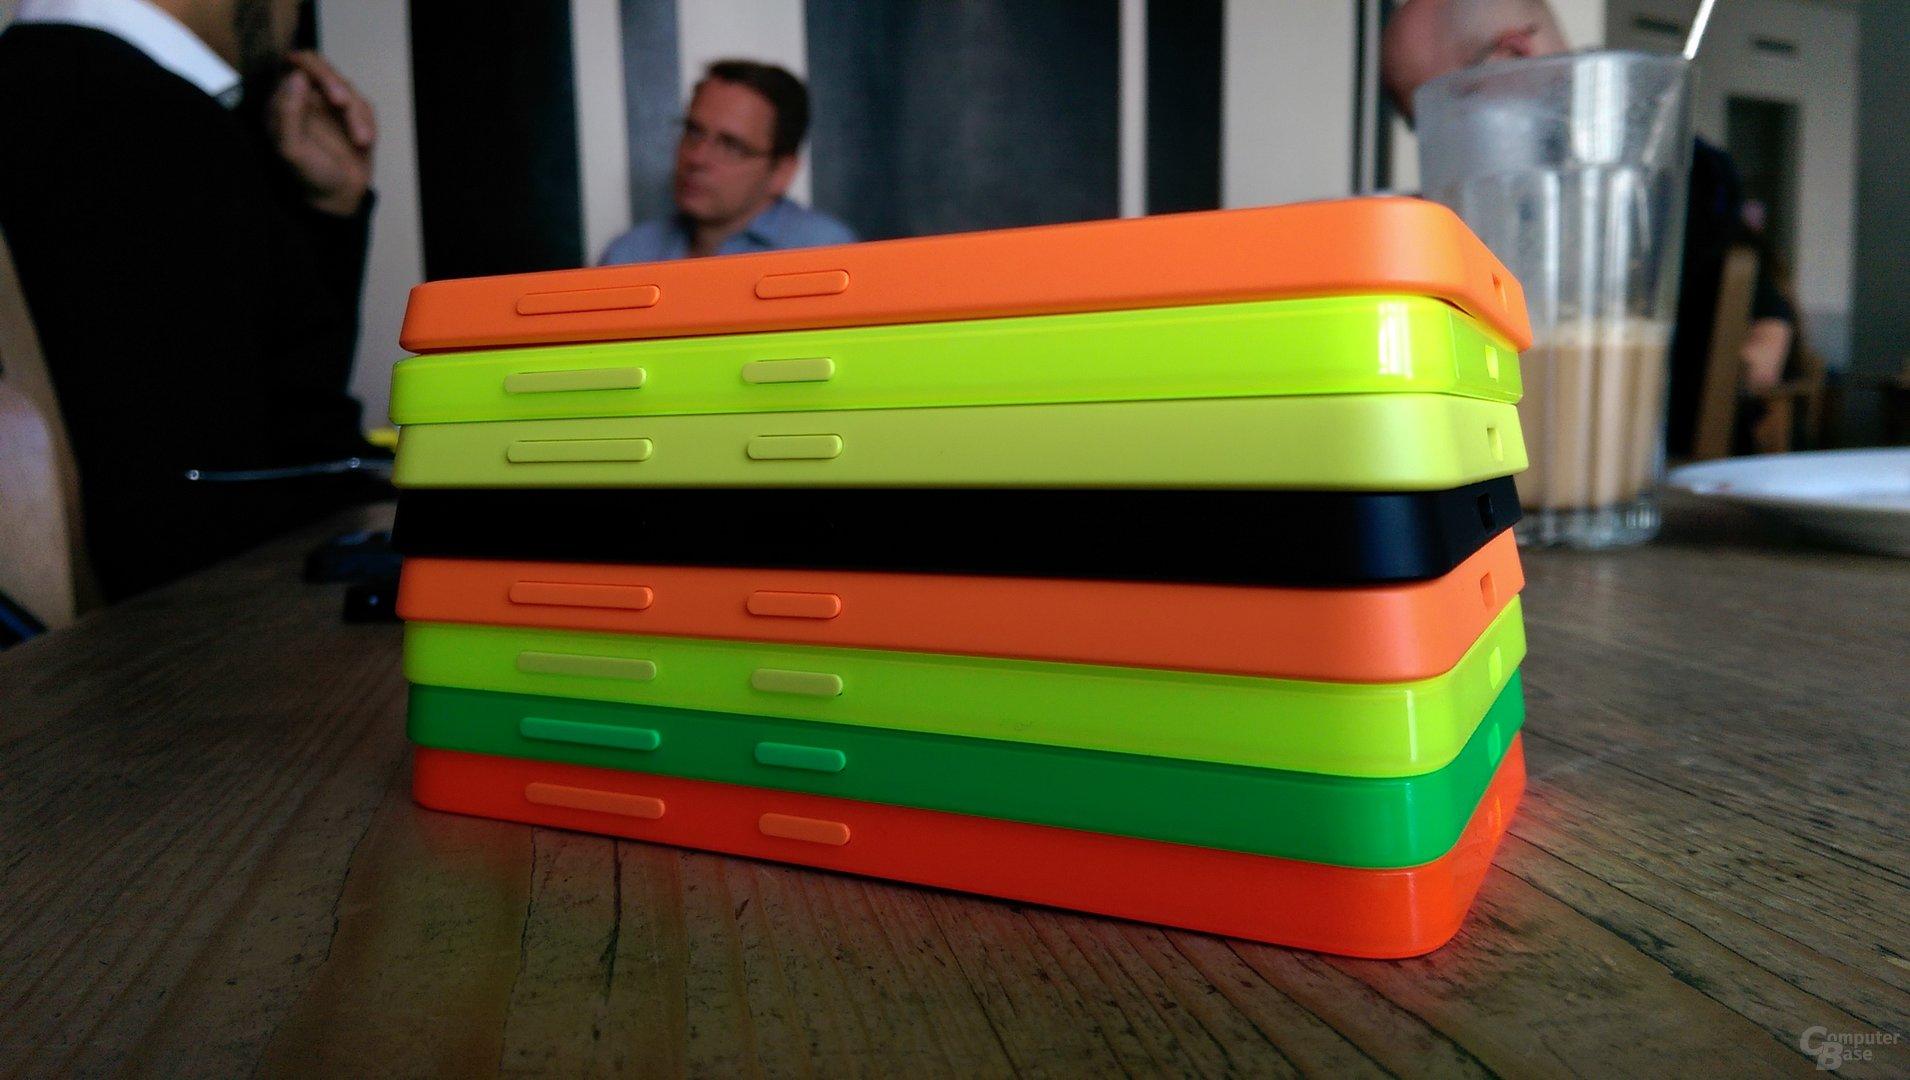 Nokia Lumia 630 und Lumia 635 ausprobiert